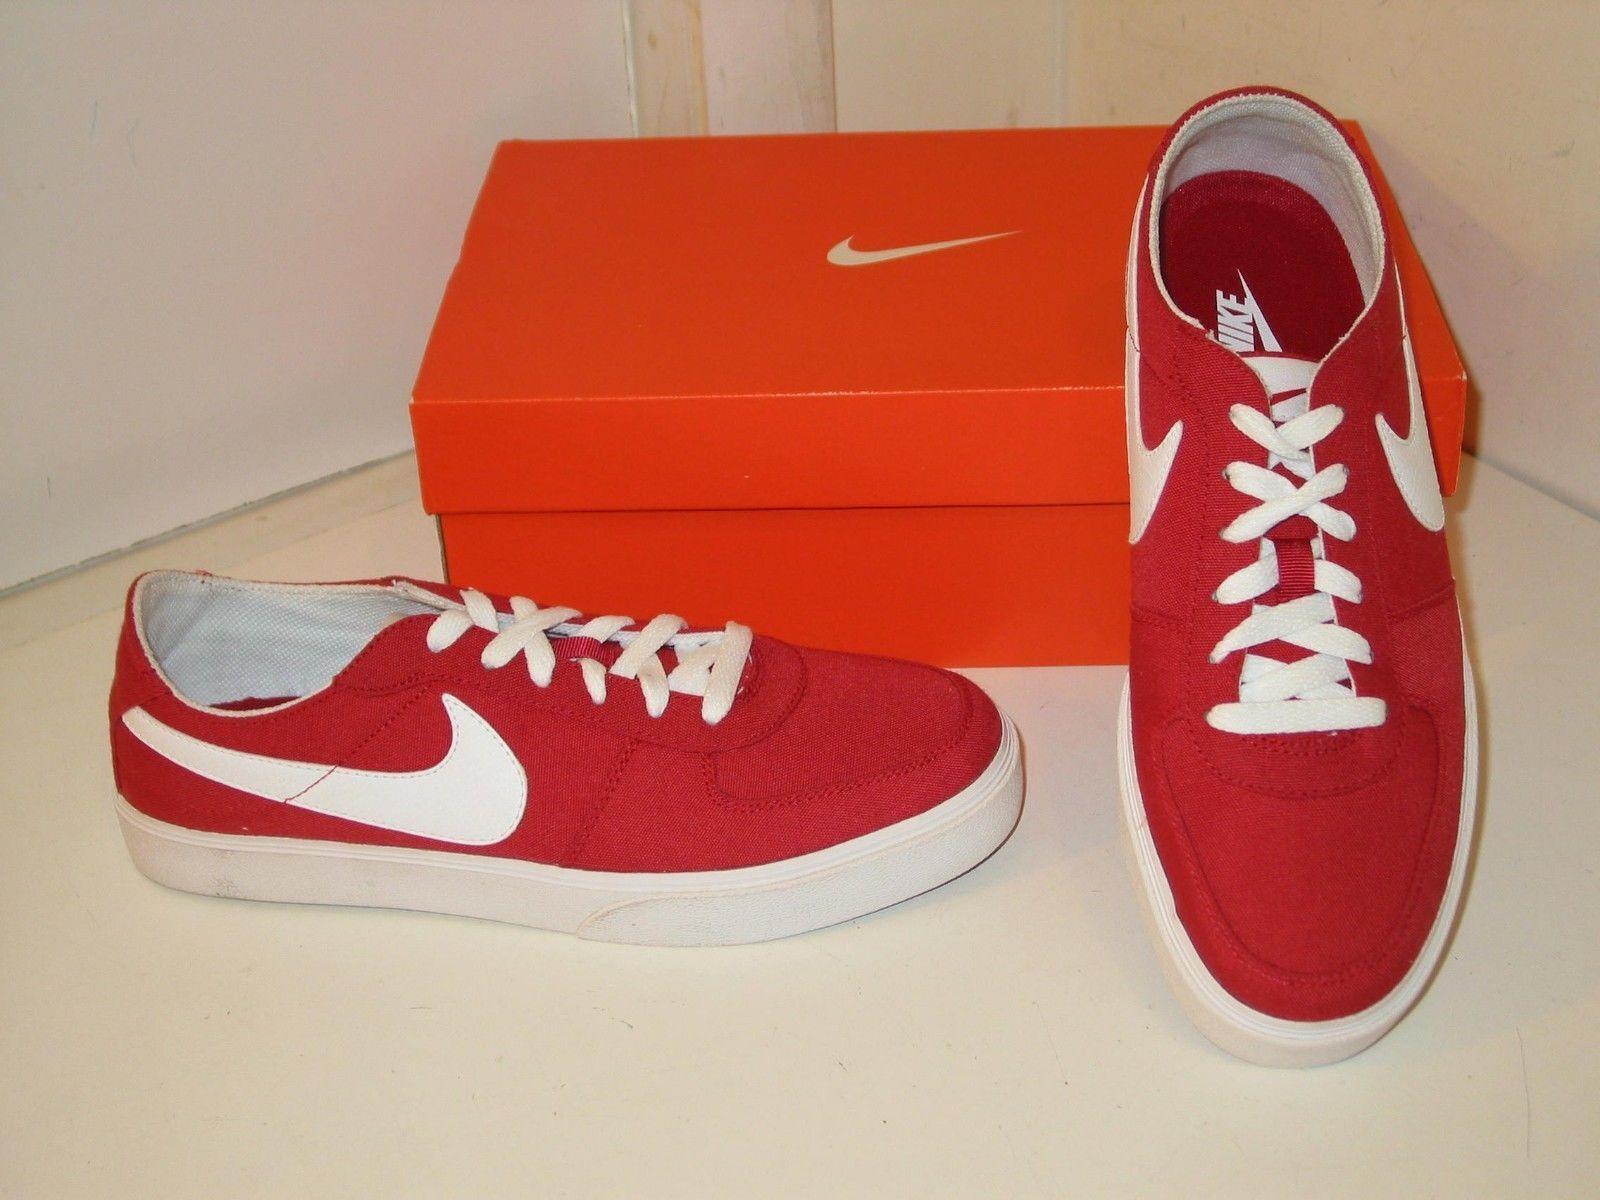 Nike Mavrk LR 6.0 Varsity Red Canvas Skateboard Casual Low  Shoes Uomo 9